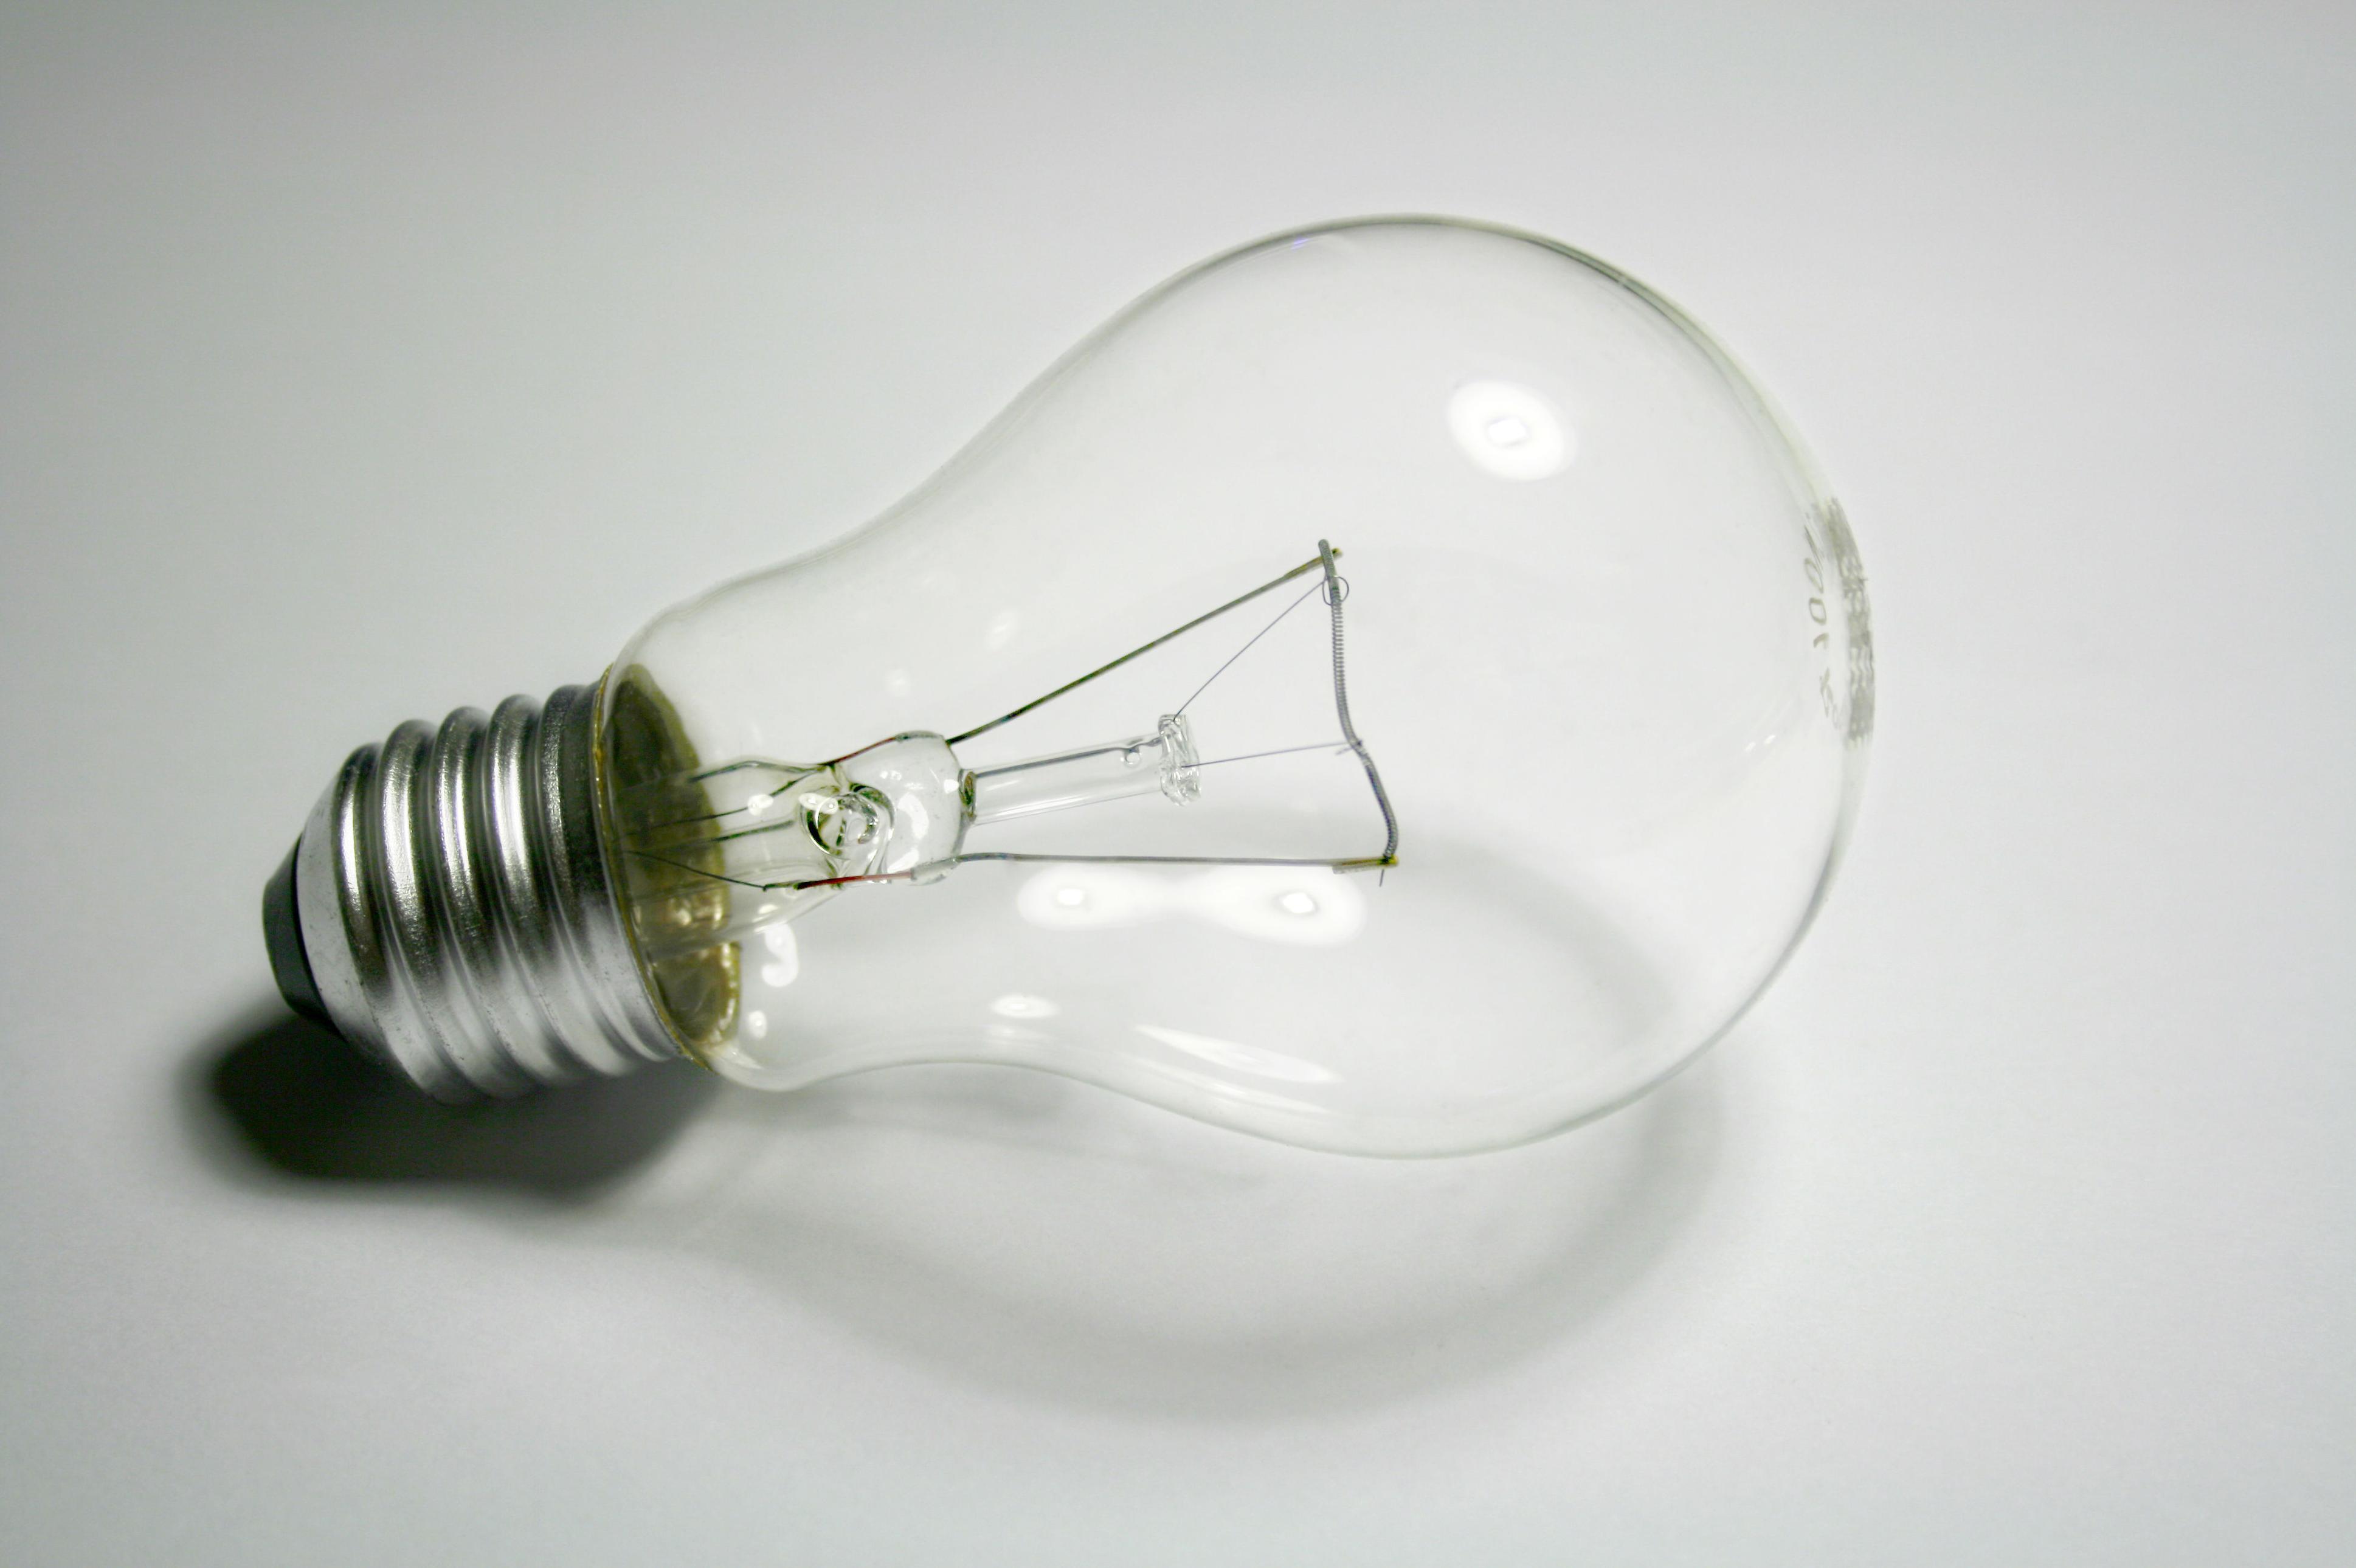 Electrosato - Electricista autorizado